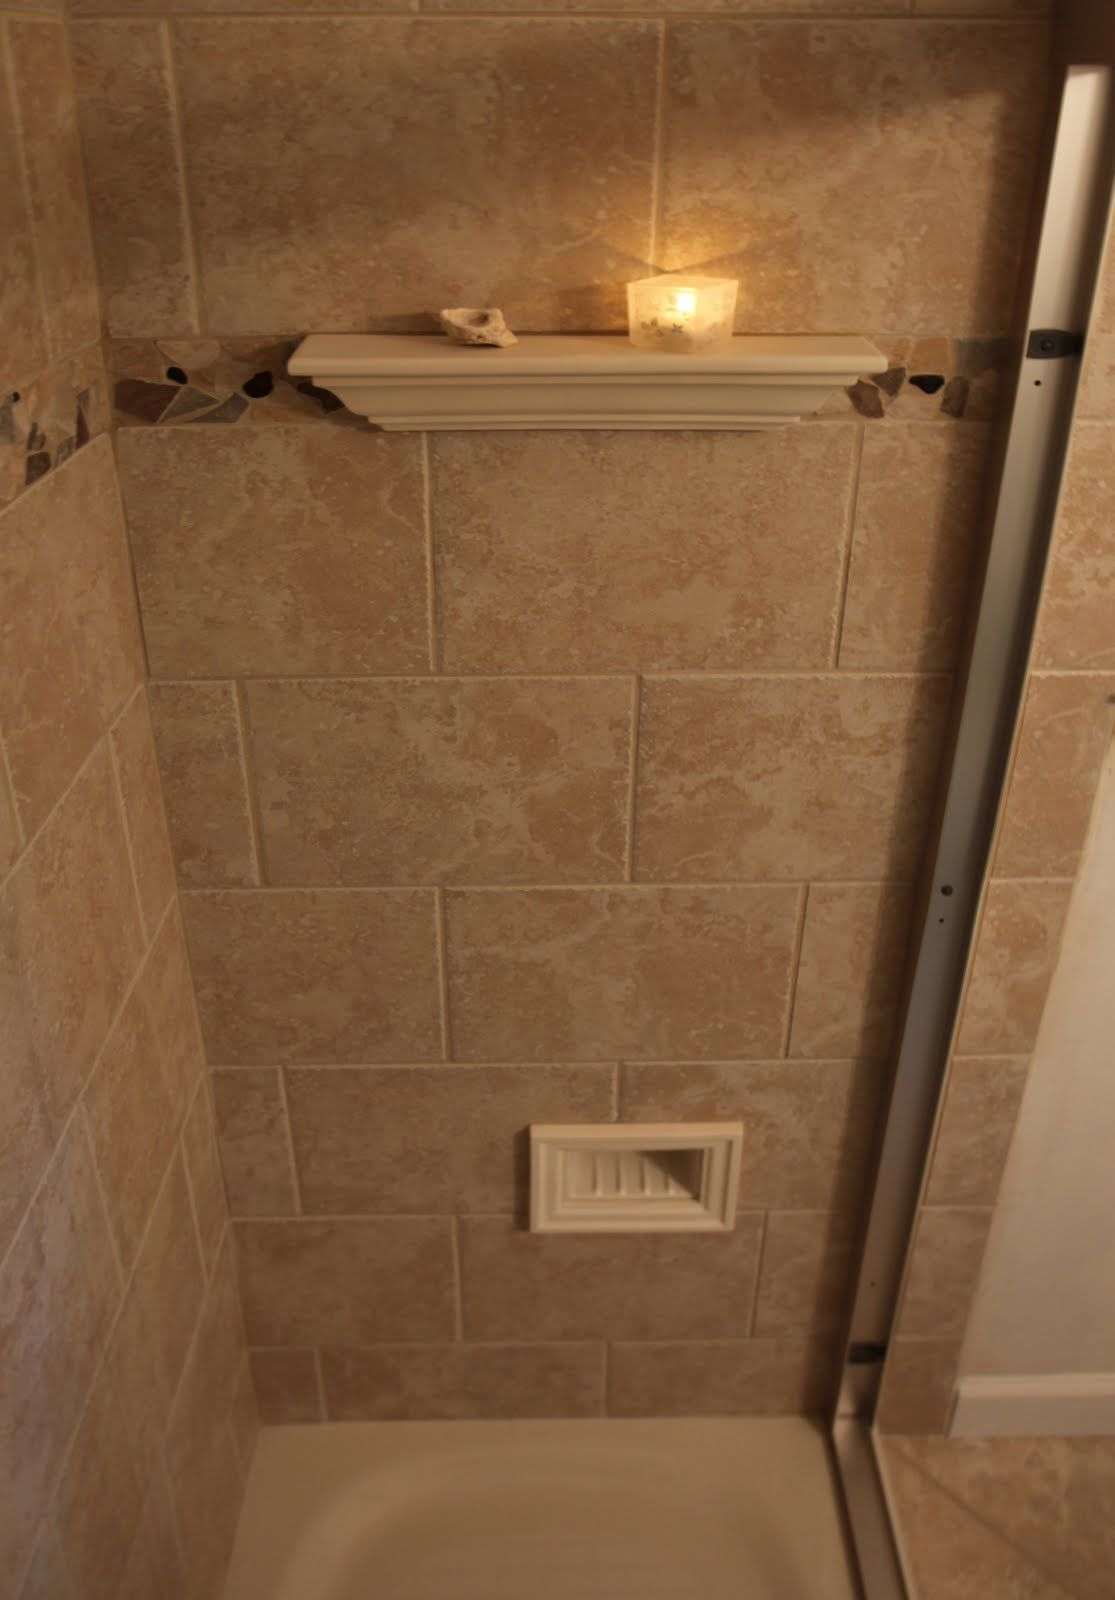 Bathroom Ceramic Tile Design New New Shower Tile Design Idea The Shower Tile Above Was Layed Out Decorating Design